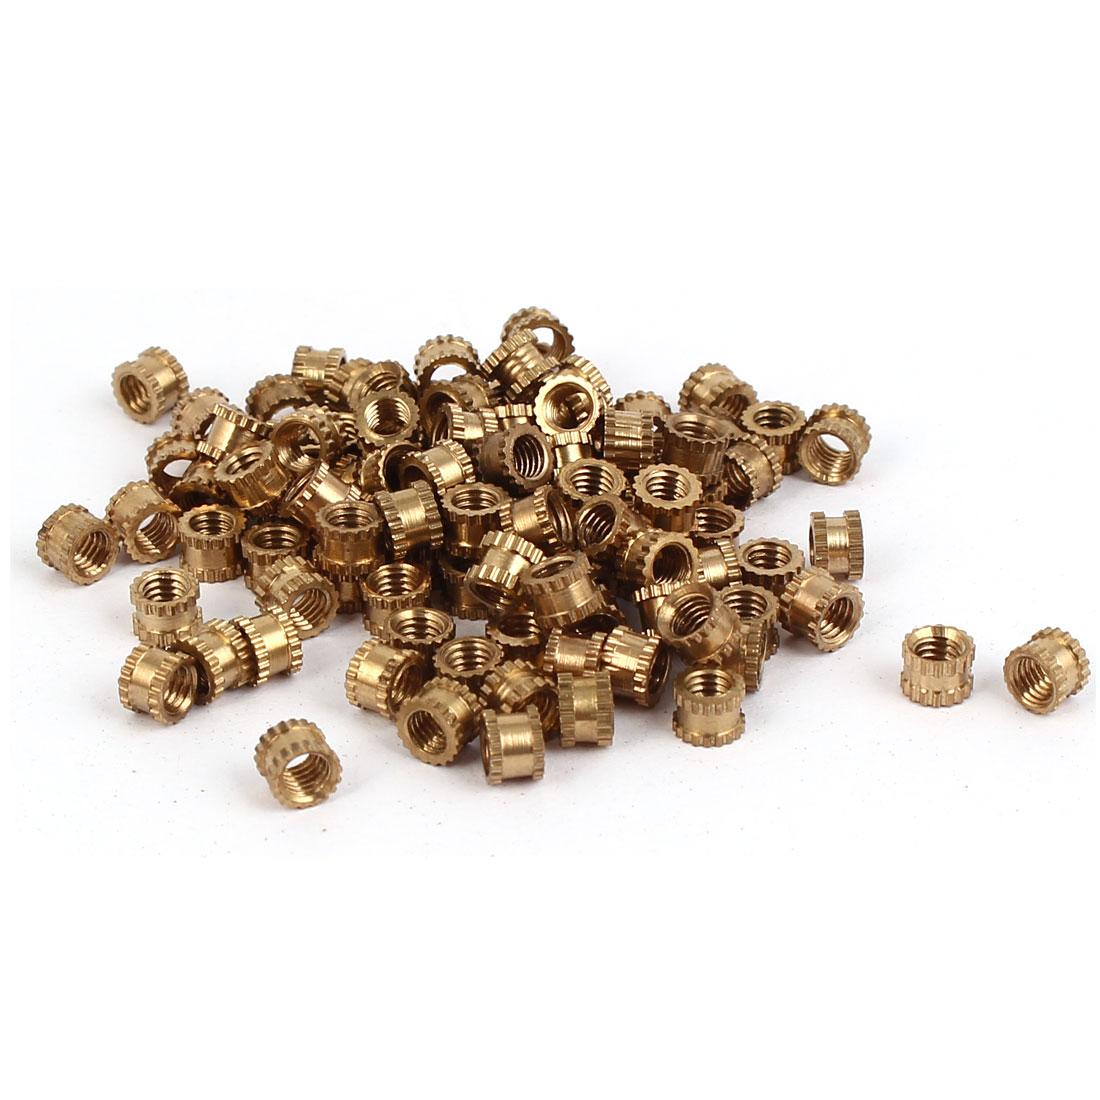 все цены на UXCELL Hot Sale 100Pcs/lot M3x3mm Female Thread Brass Knurled Nuts Threaded Insert 0.5mm Pitch Embedment Nuts Fastener Accessory онлайн